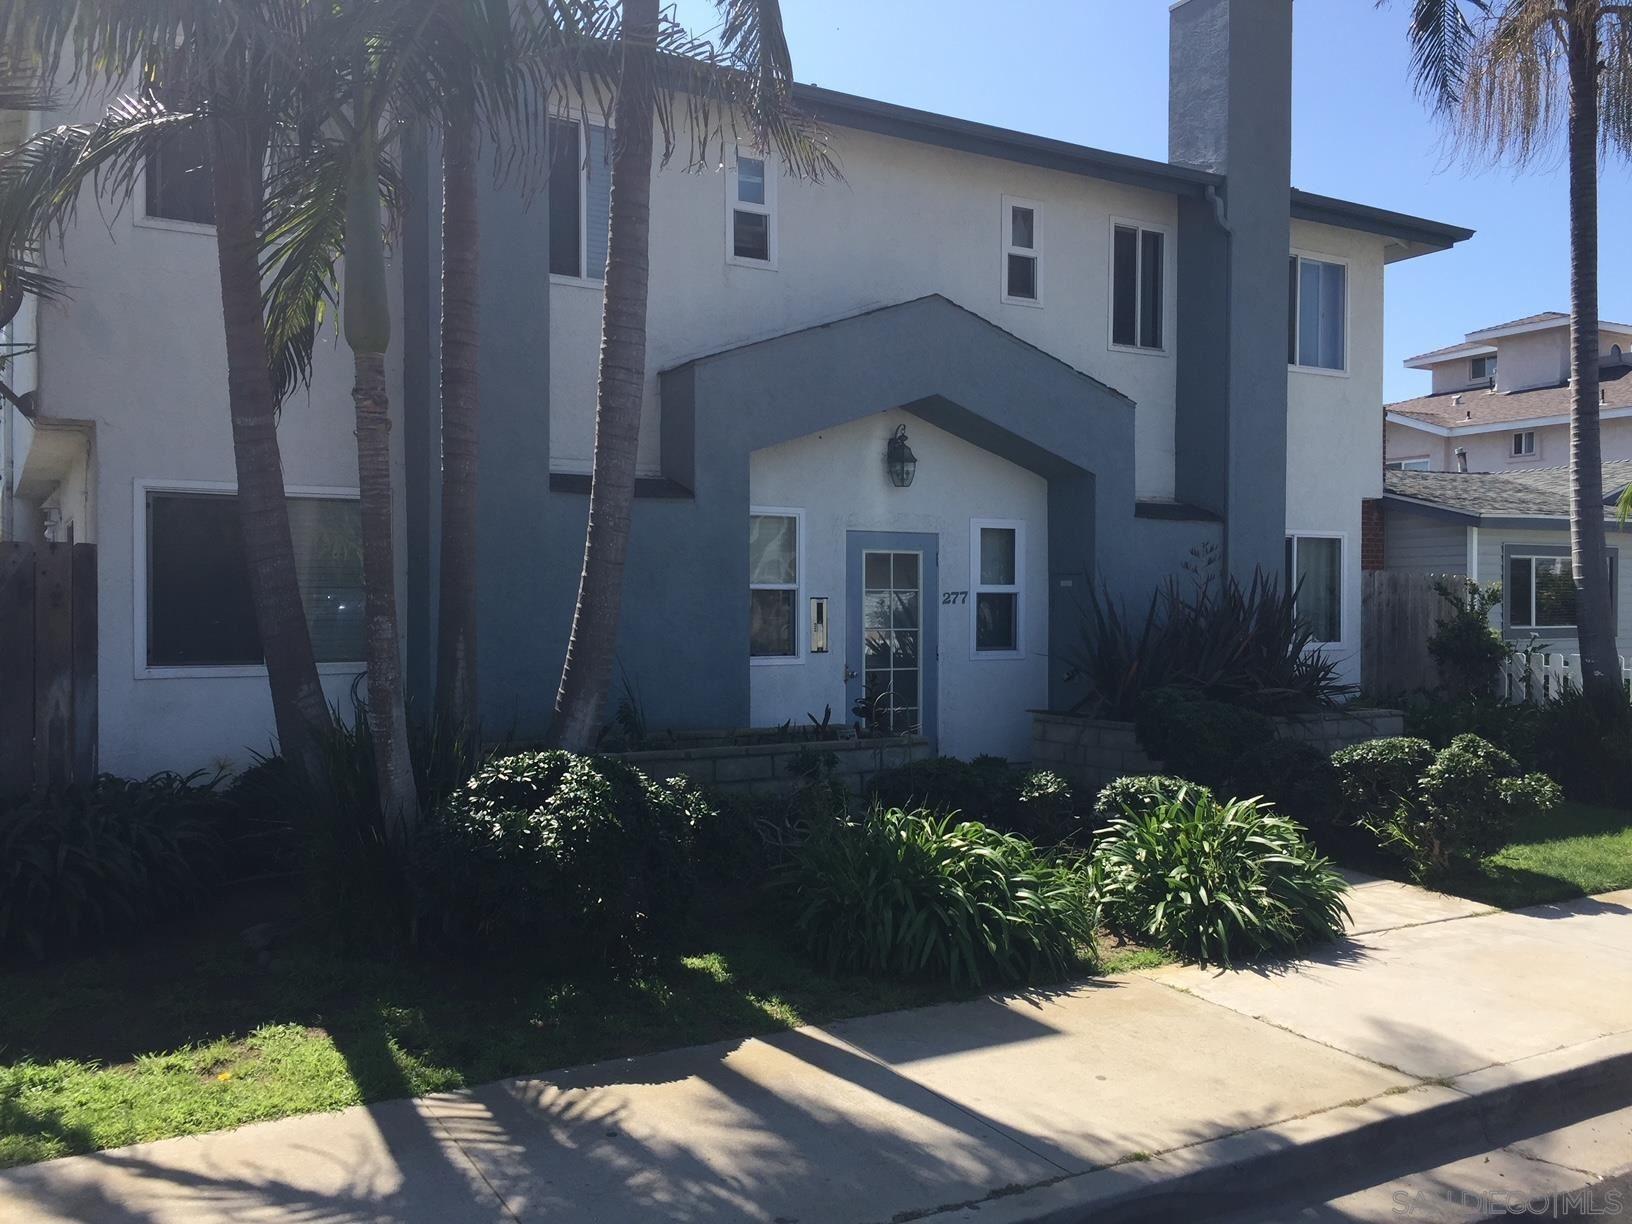 Photo of 277 Elm Avenue #A, Imperial Beach, CA 91932 (MLS # 210025215)